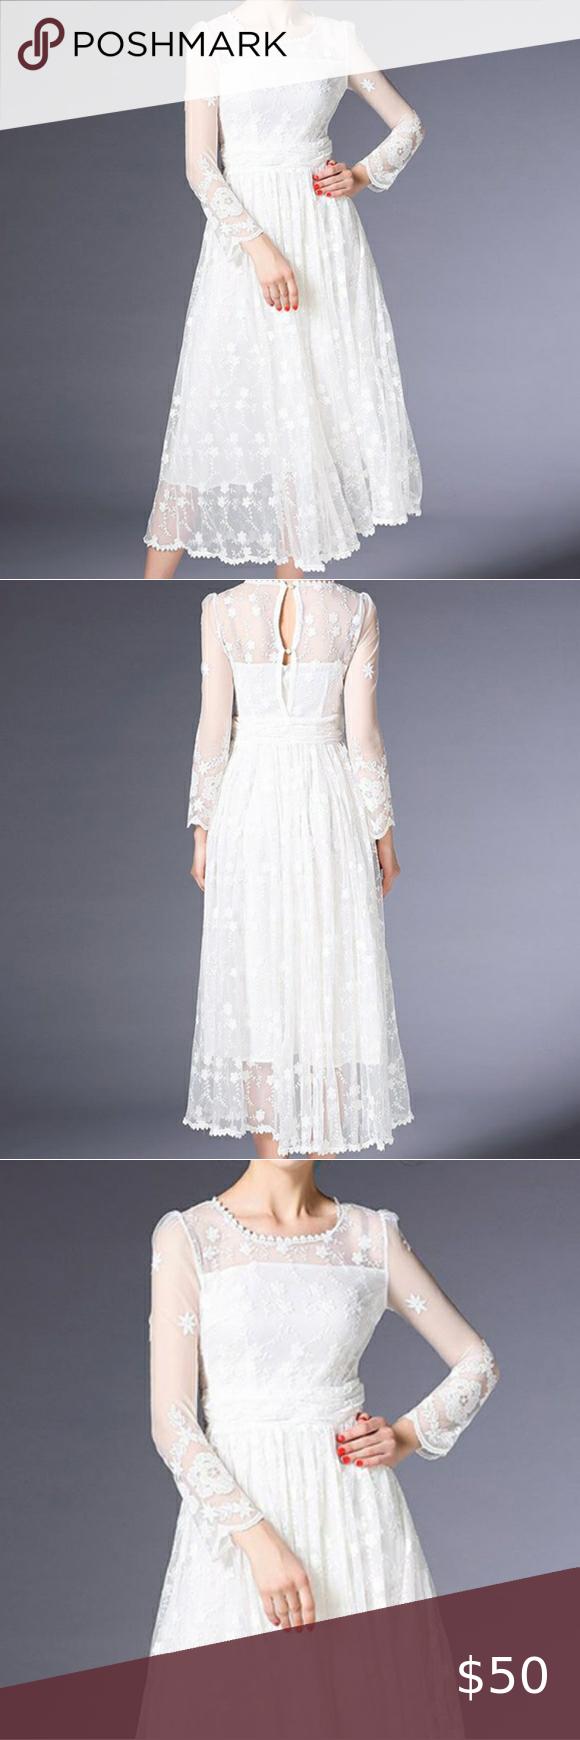 Metisu White See Through Lace Dress S Lace Dress Dresses See Through Dress [ 1740 x 580 Pixel ]